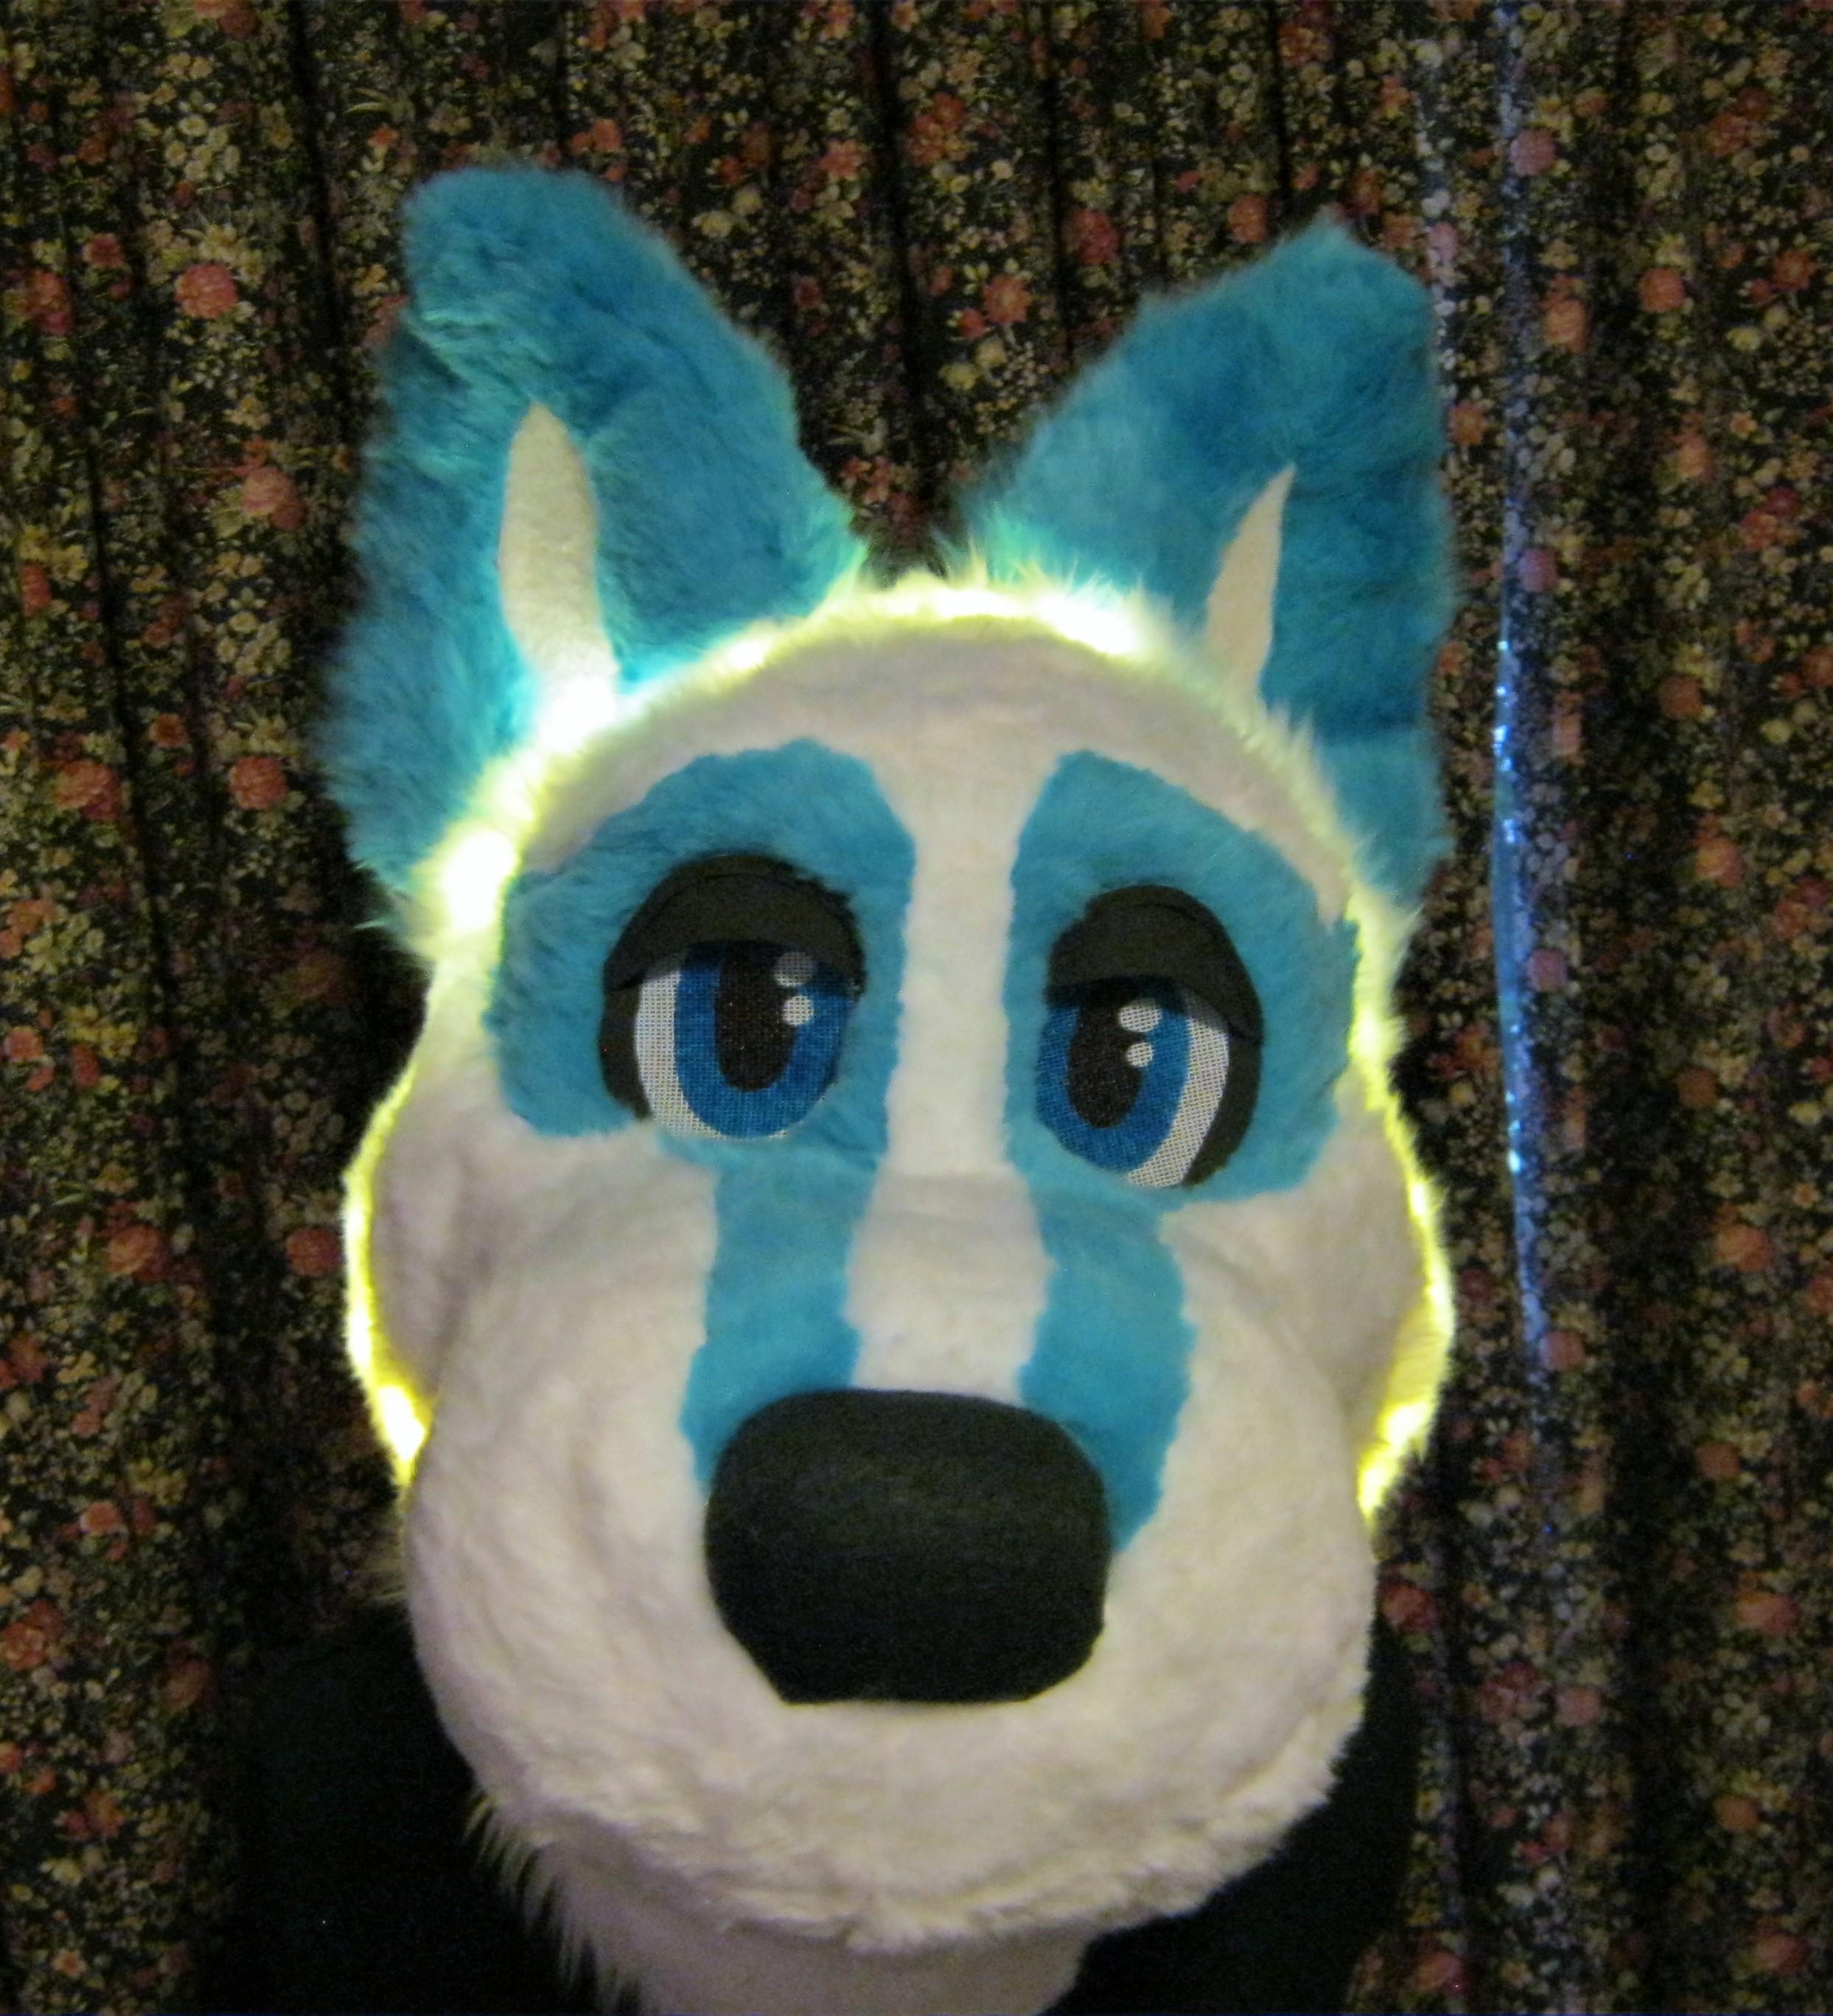 Tsuki LEDs